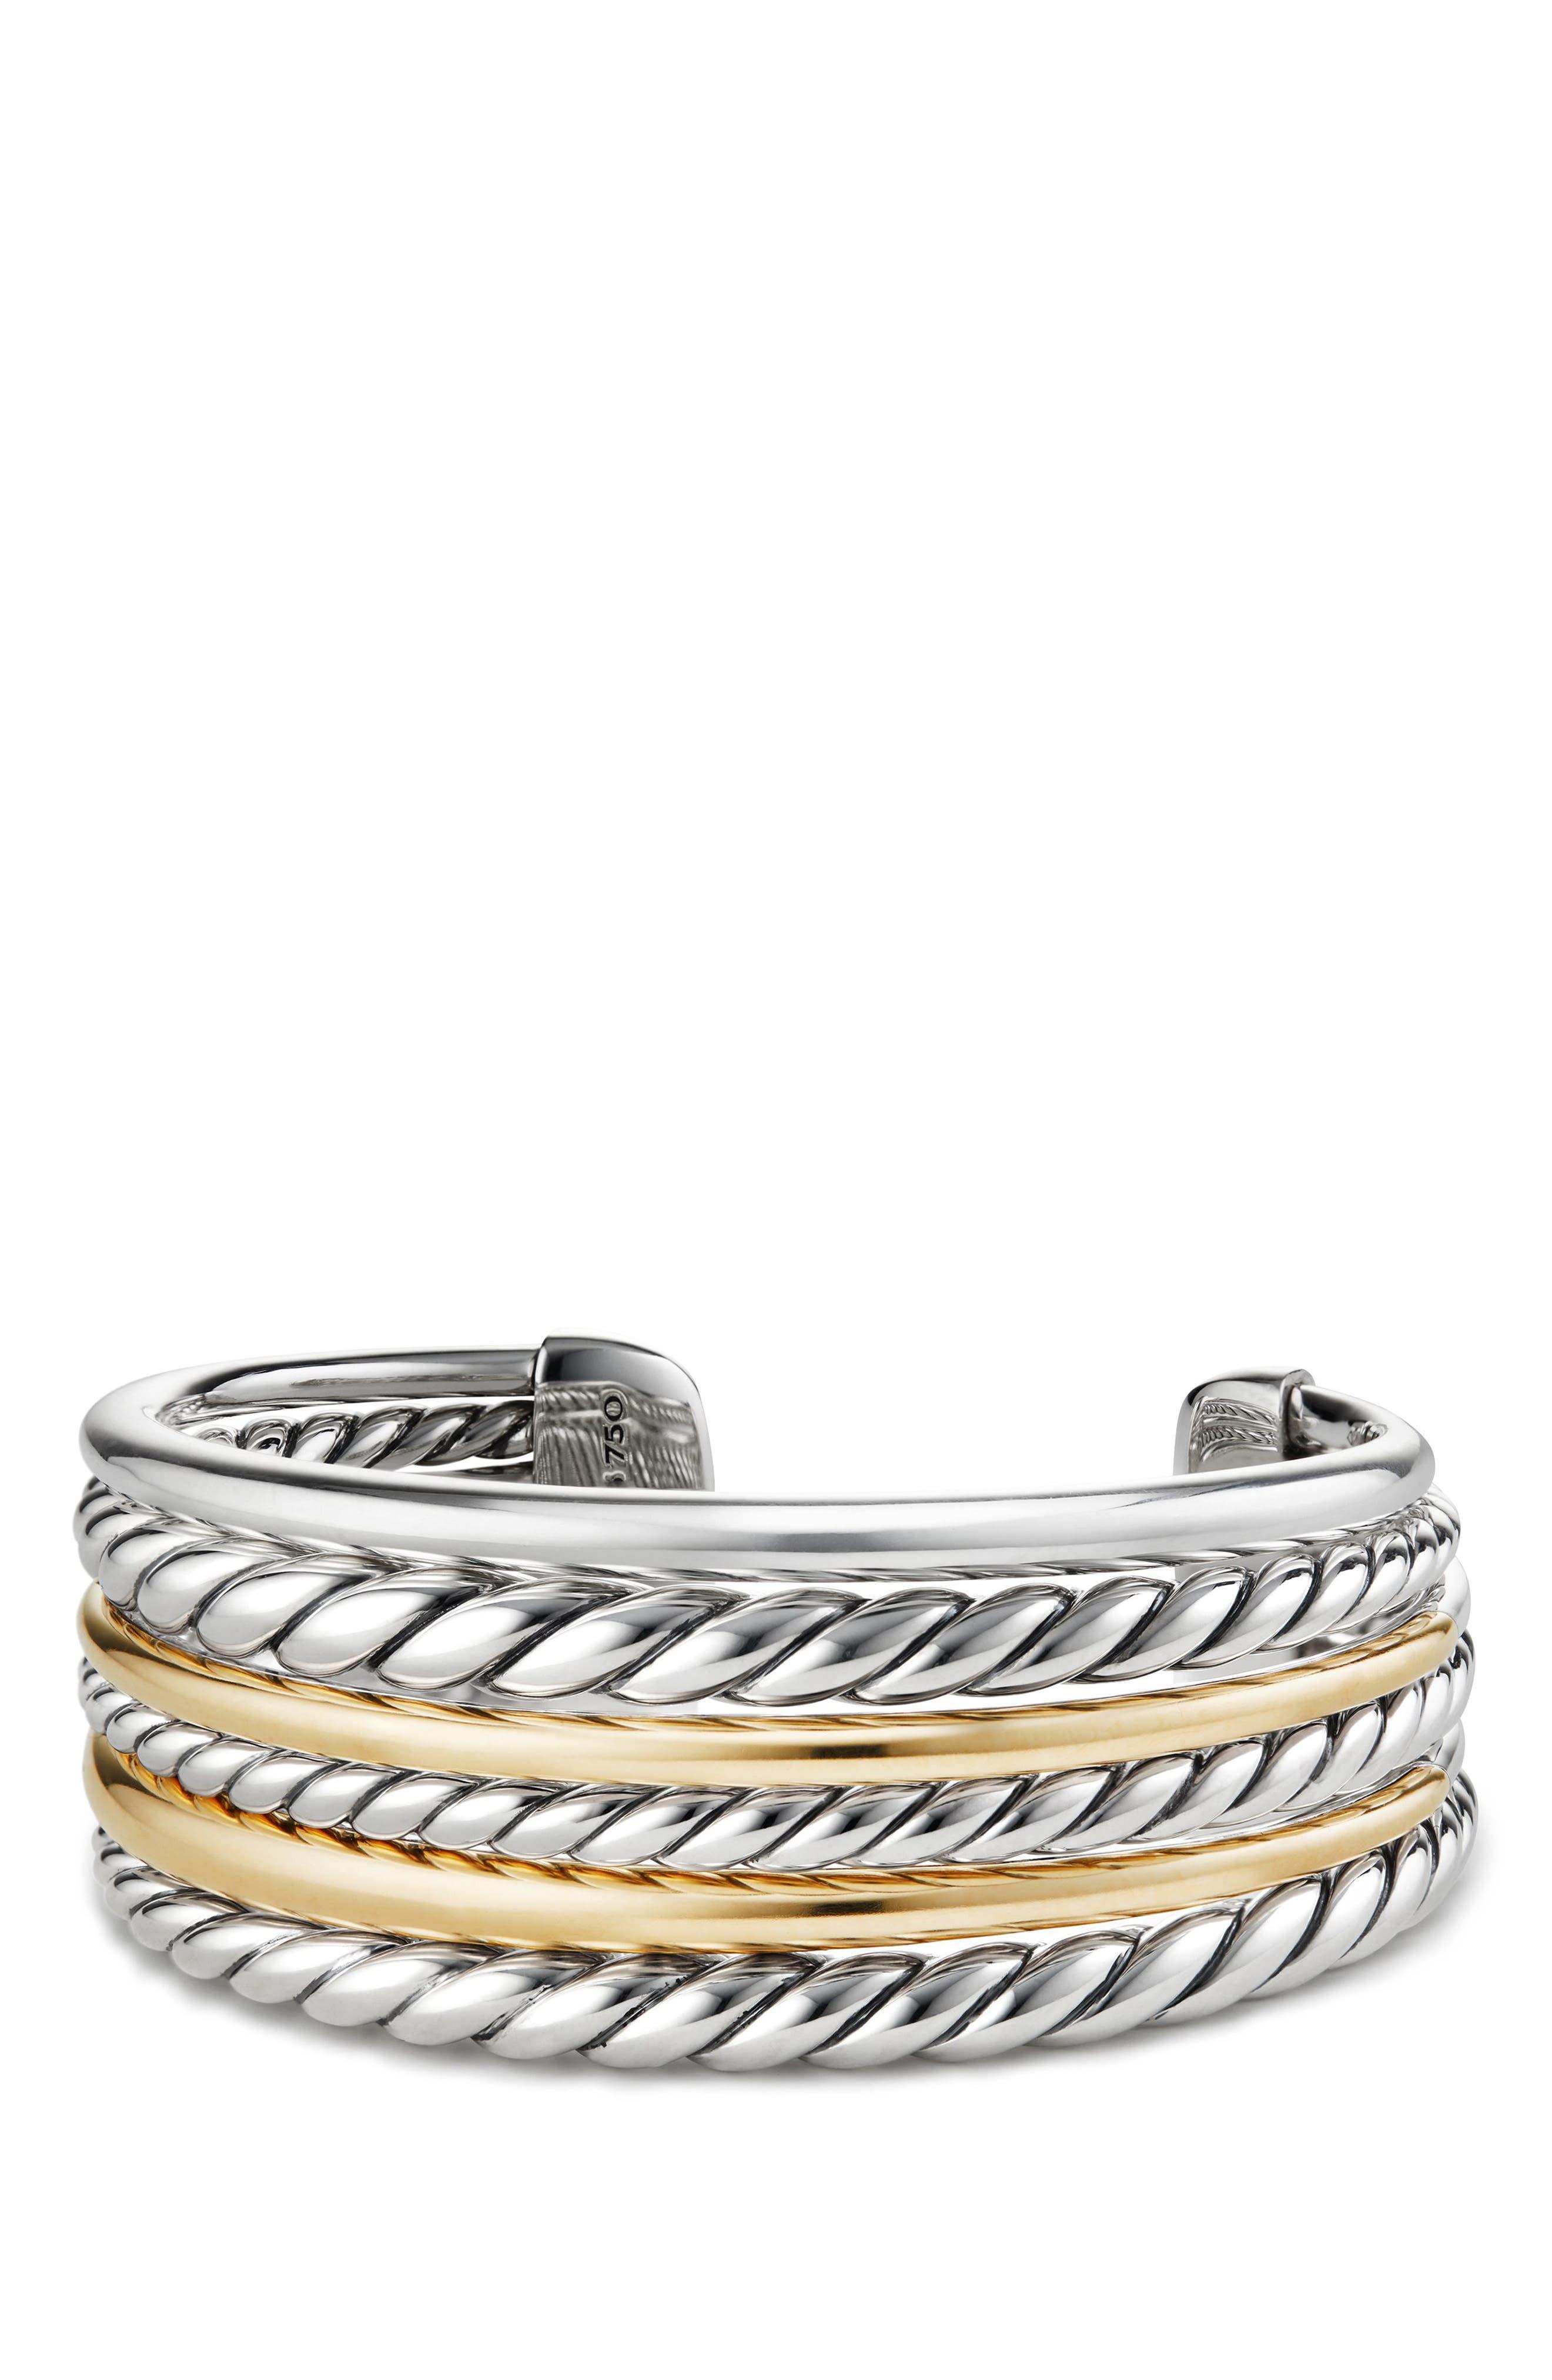 Pure Form<sup>®</sup> Cuff Bracelet,                             Main thumbnail 1, color,                             Gold/ Silver